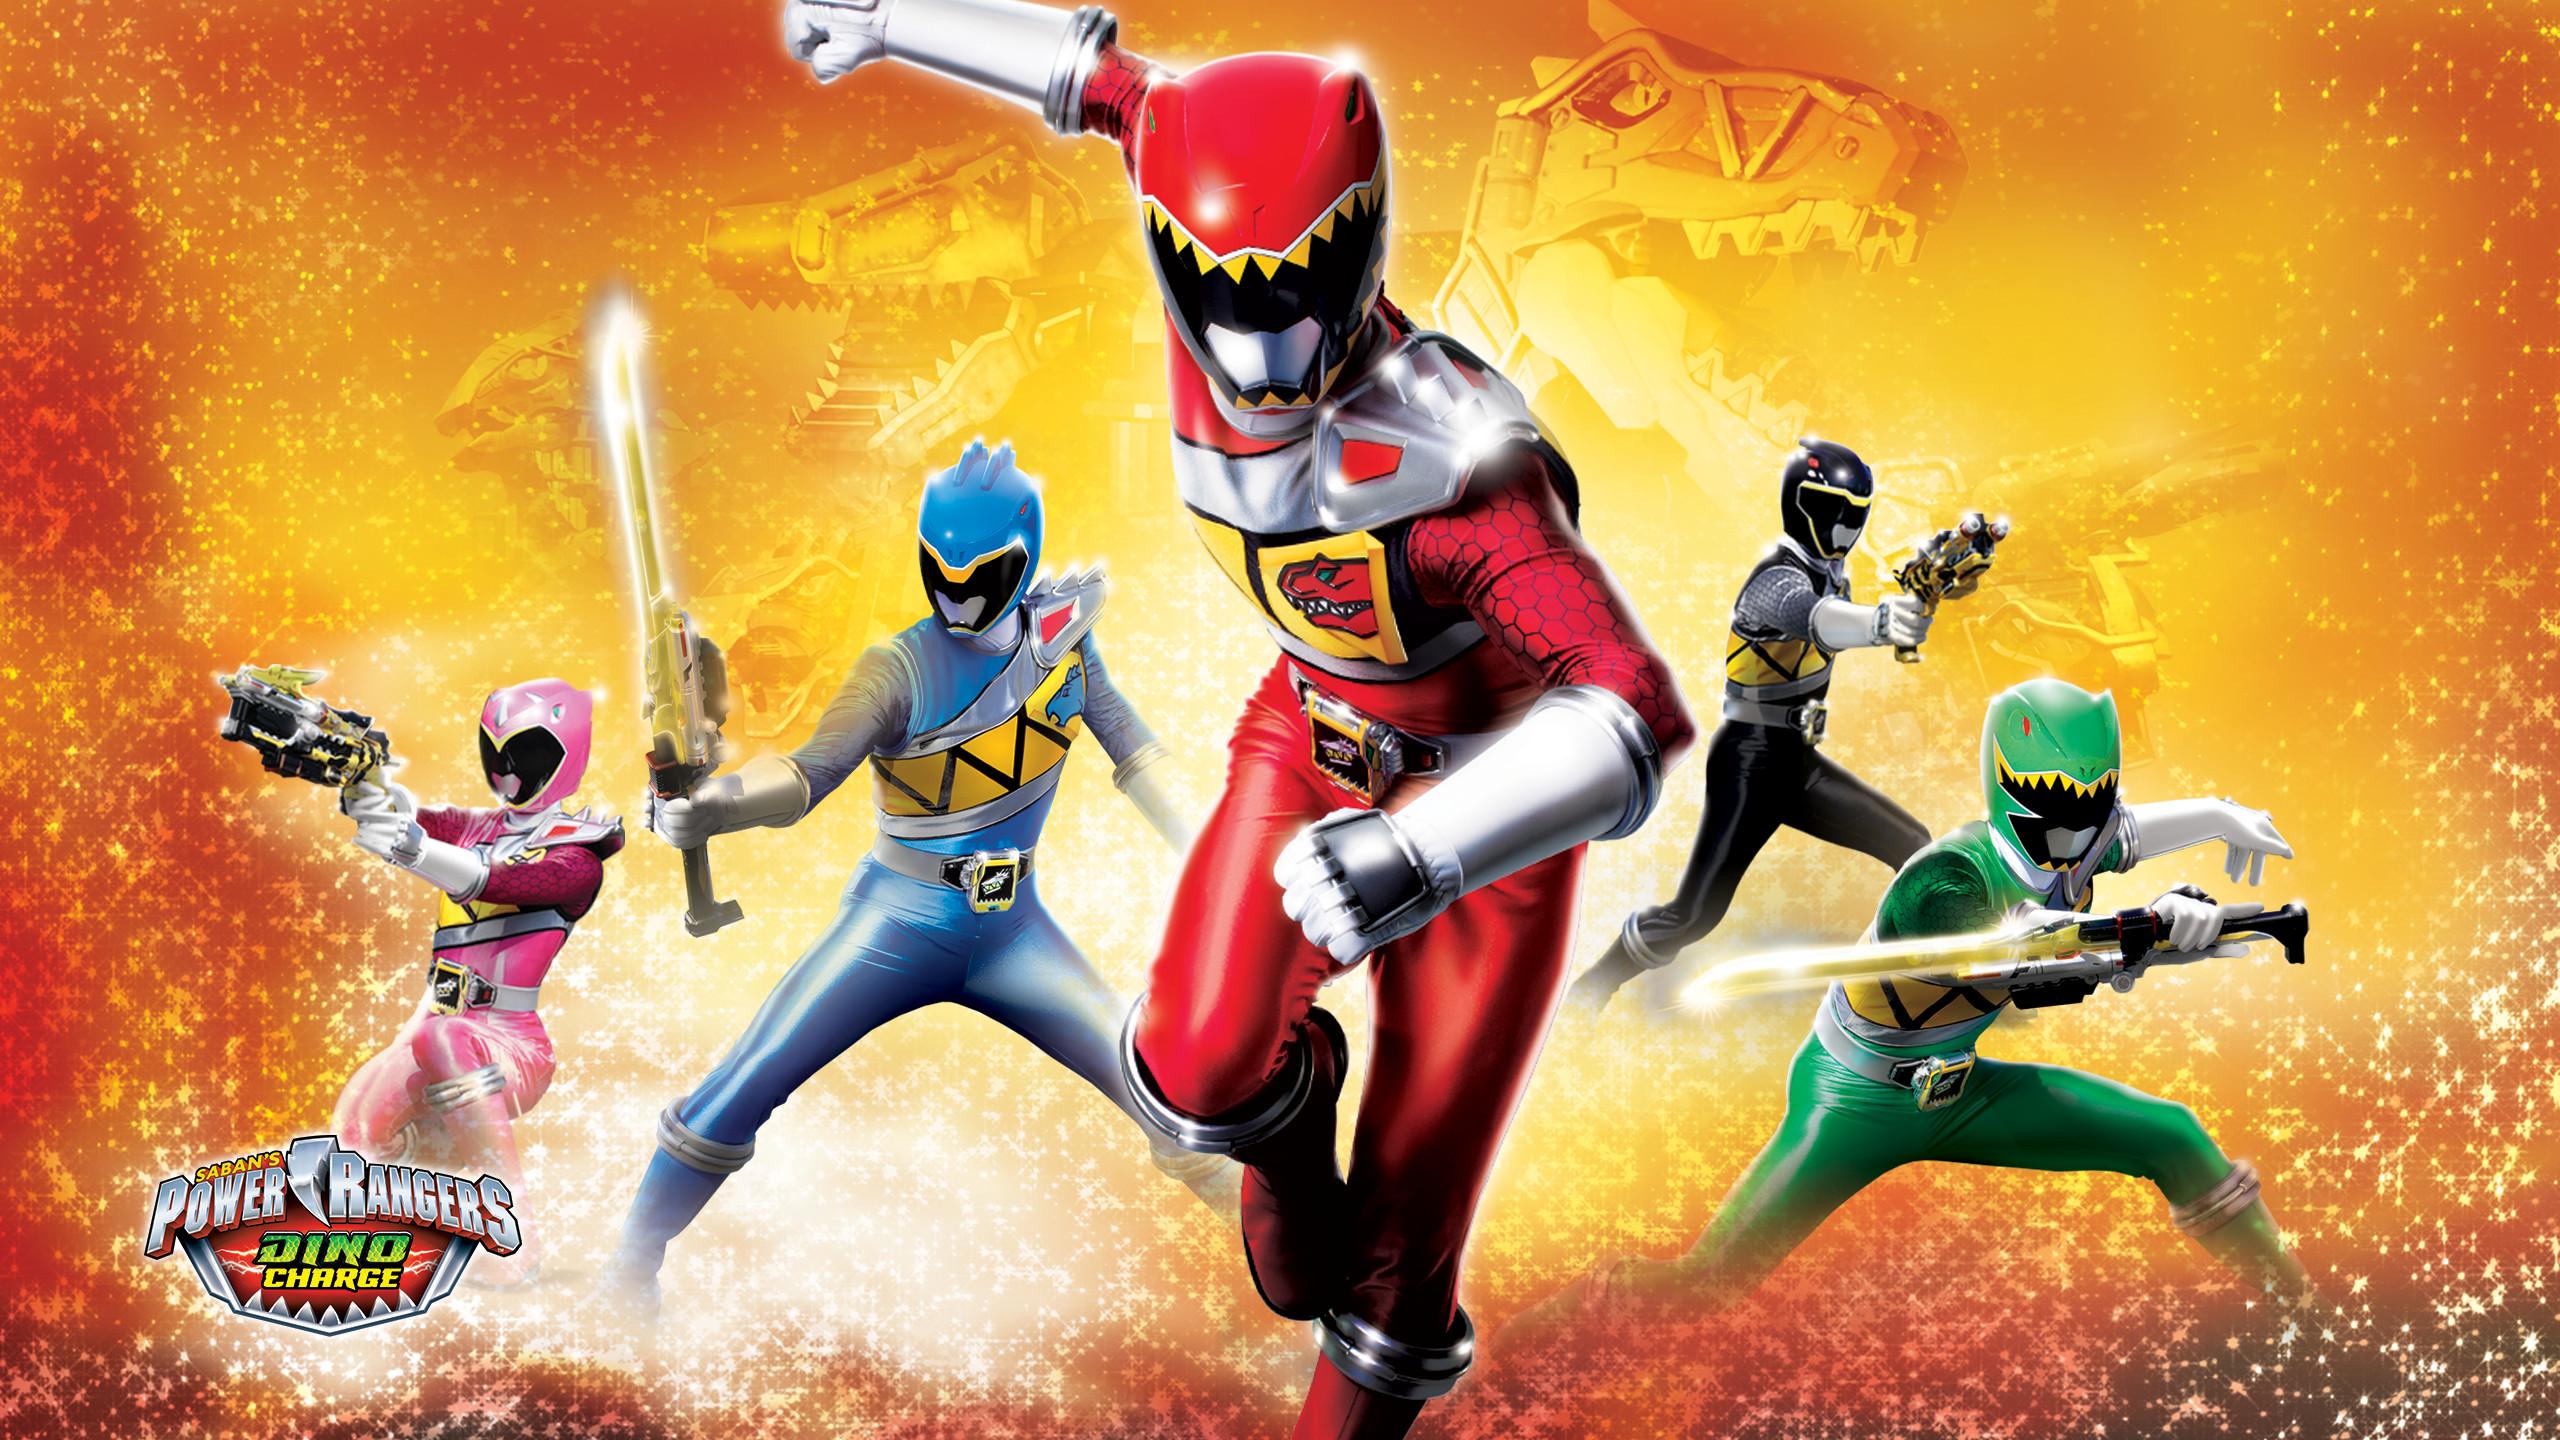 2048x2048 Power Rangers Super Megaforce